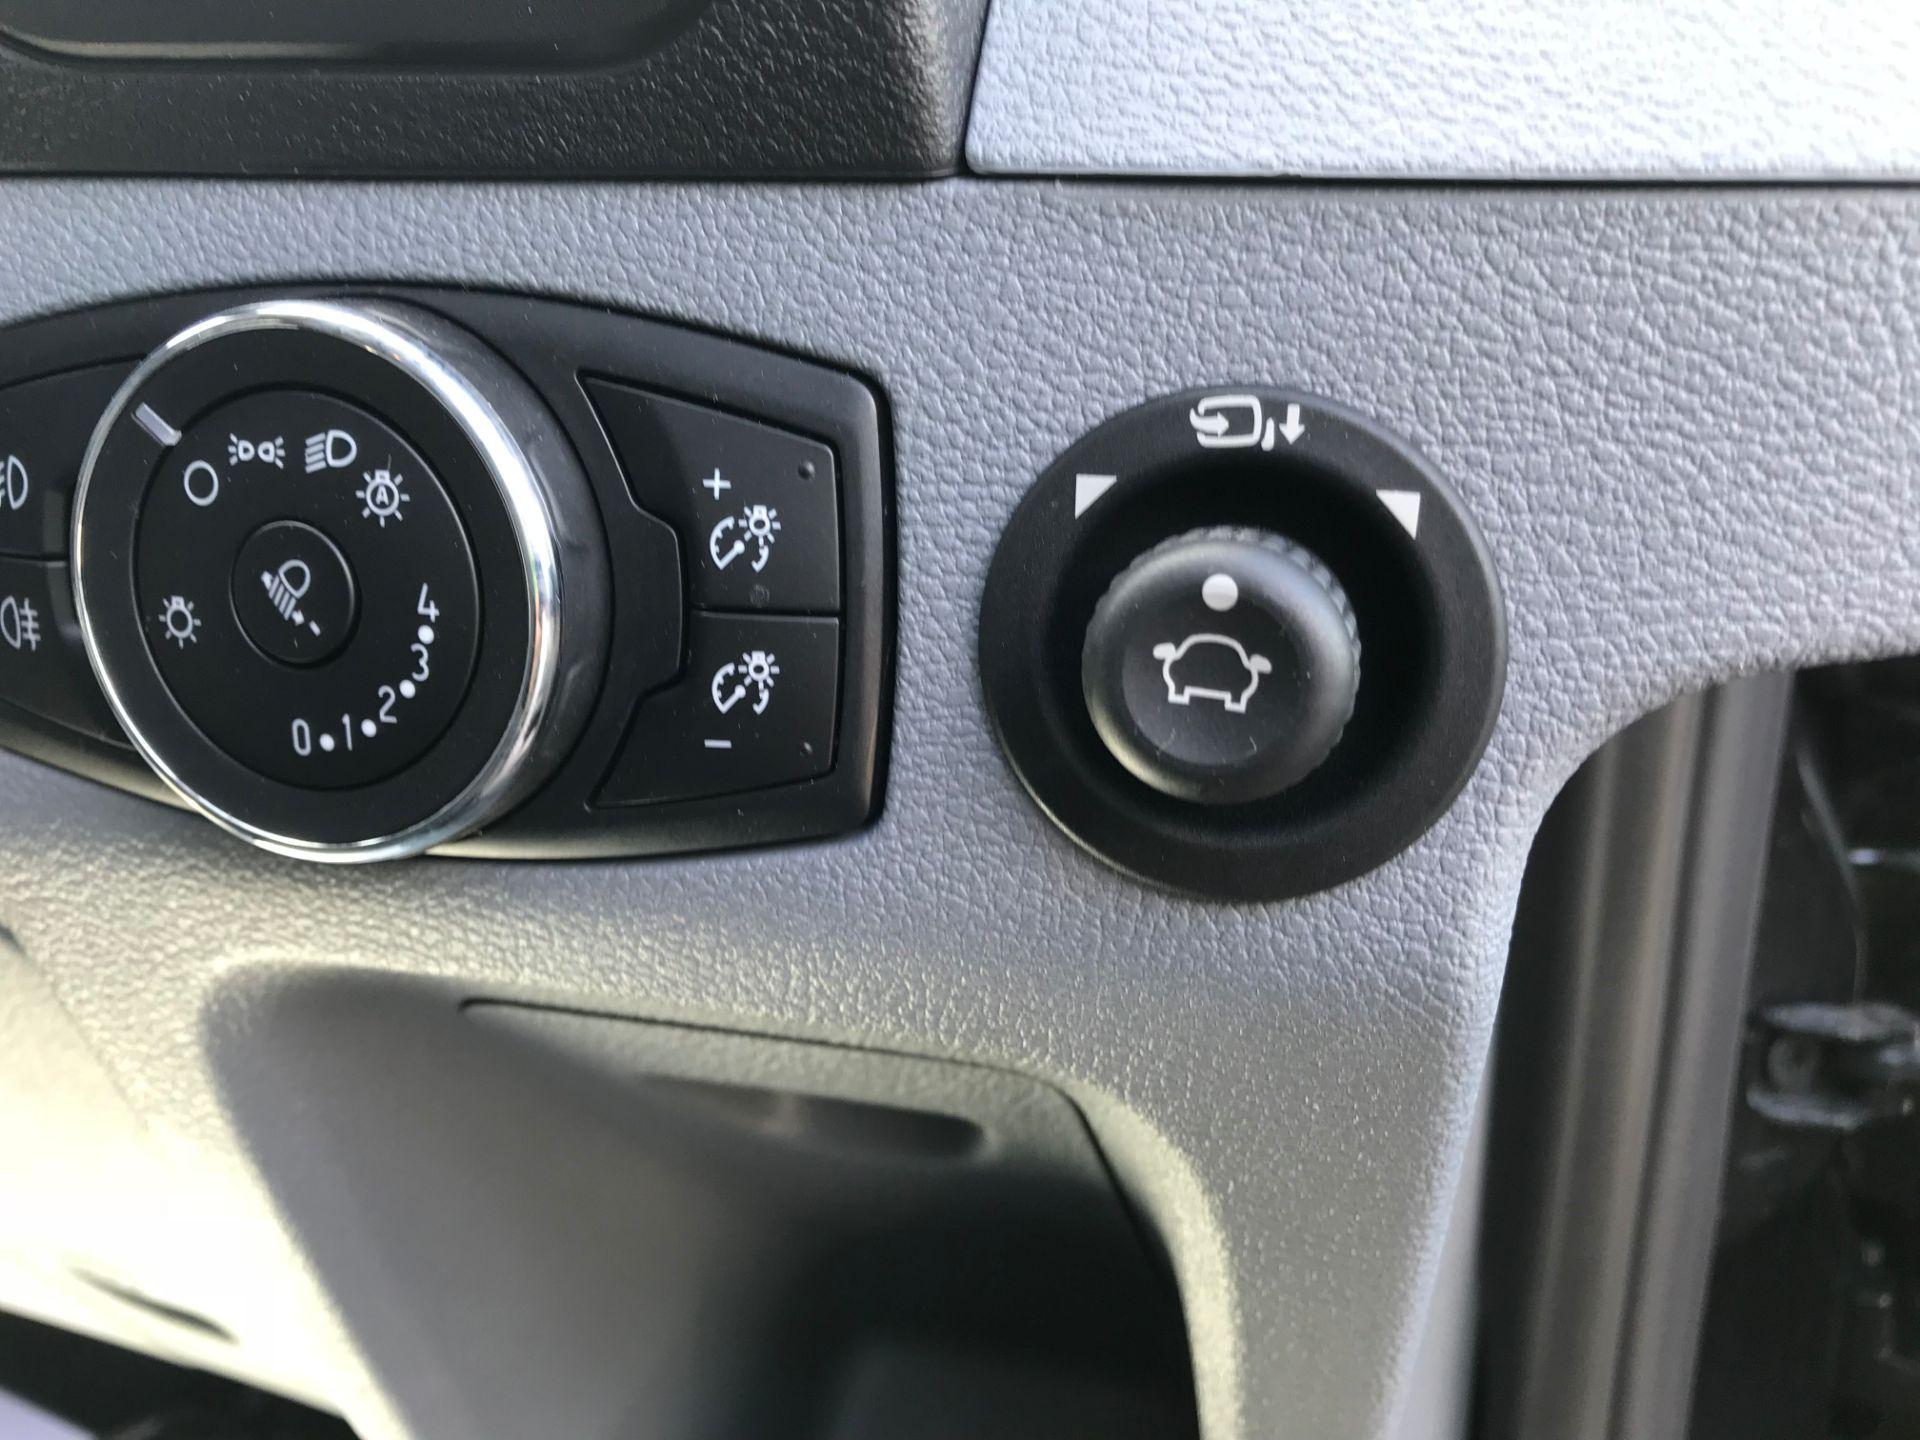 2018 Ford Transit 2.0 TDCi 130ps H2 D/Cab Trend Van Auto (WP68WHL) Image 21